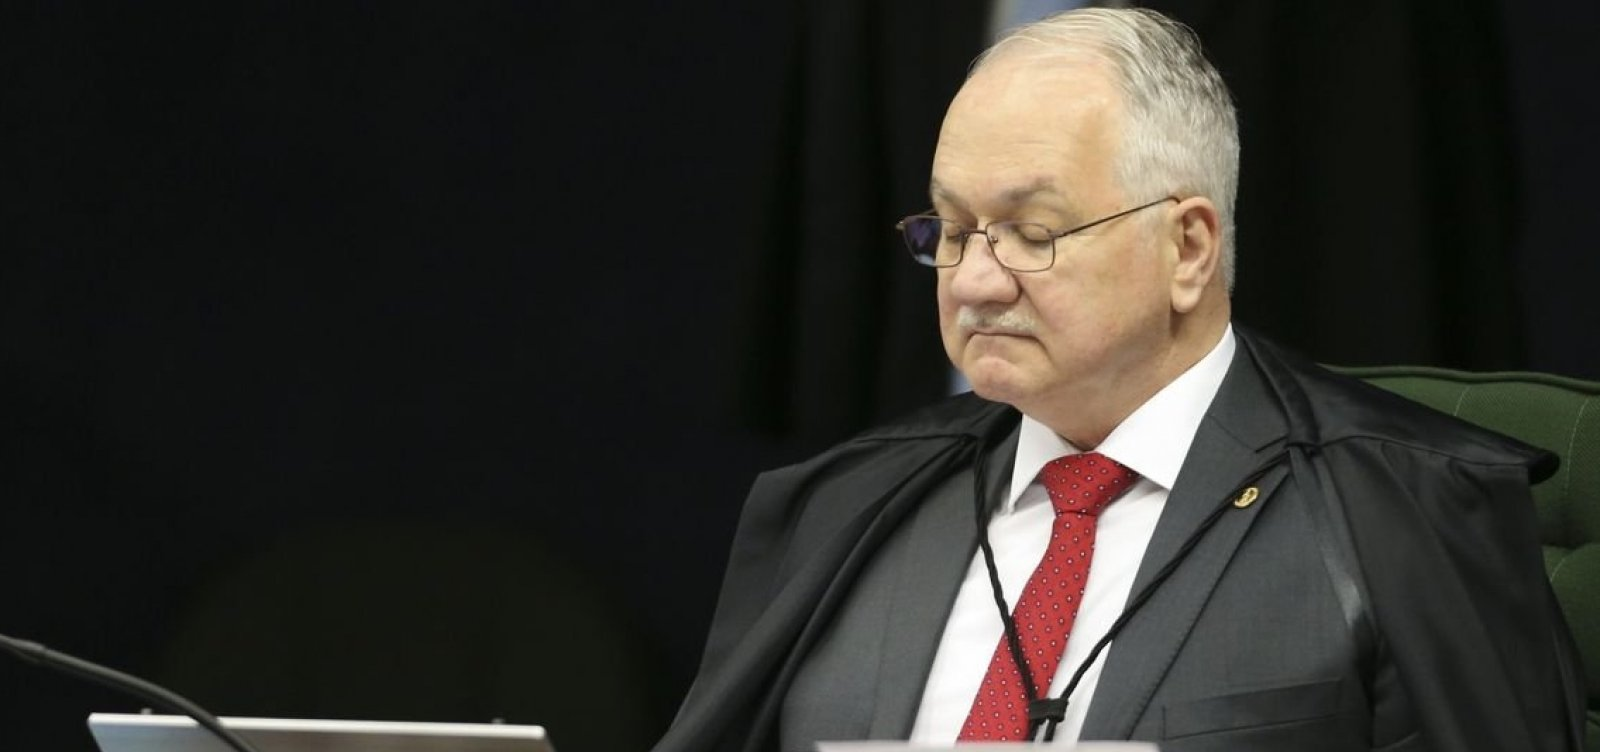 A pedido da PGR, Fachin arquiva inquérito contra Blairo Maggi e Zeca do PT